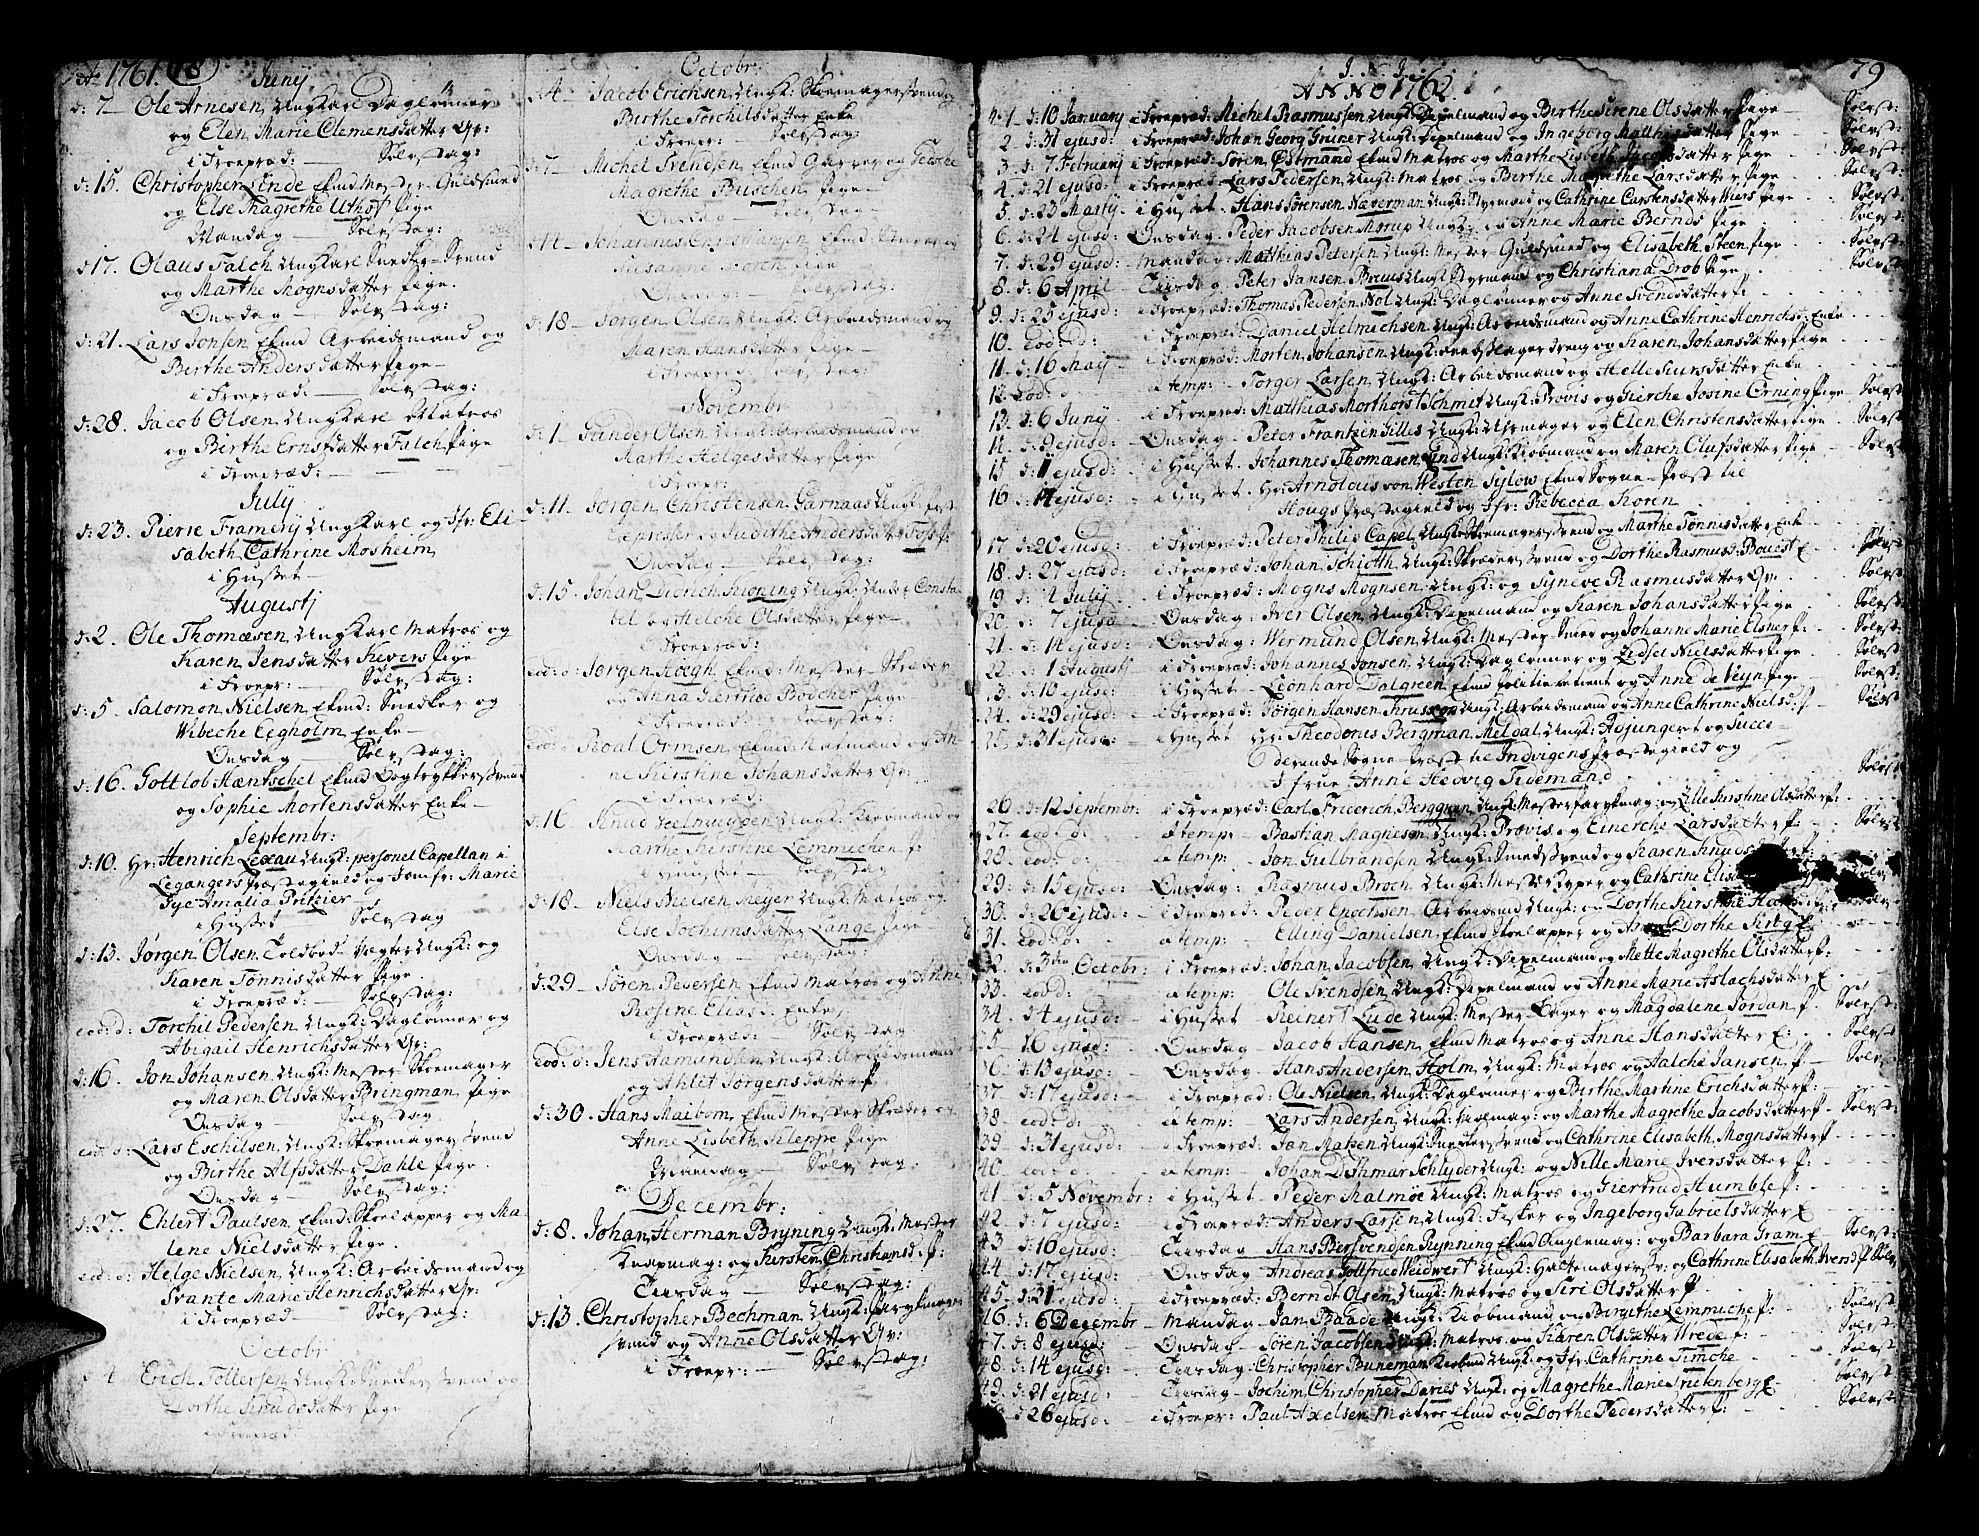 SAB, Domkirken sokneprestembete, H/Haa/L0007: Ministerialbok nr. A 7, 1725-1826, s. 78-79